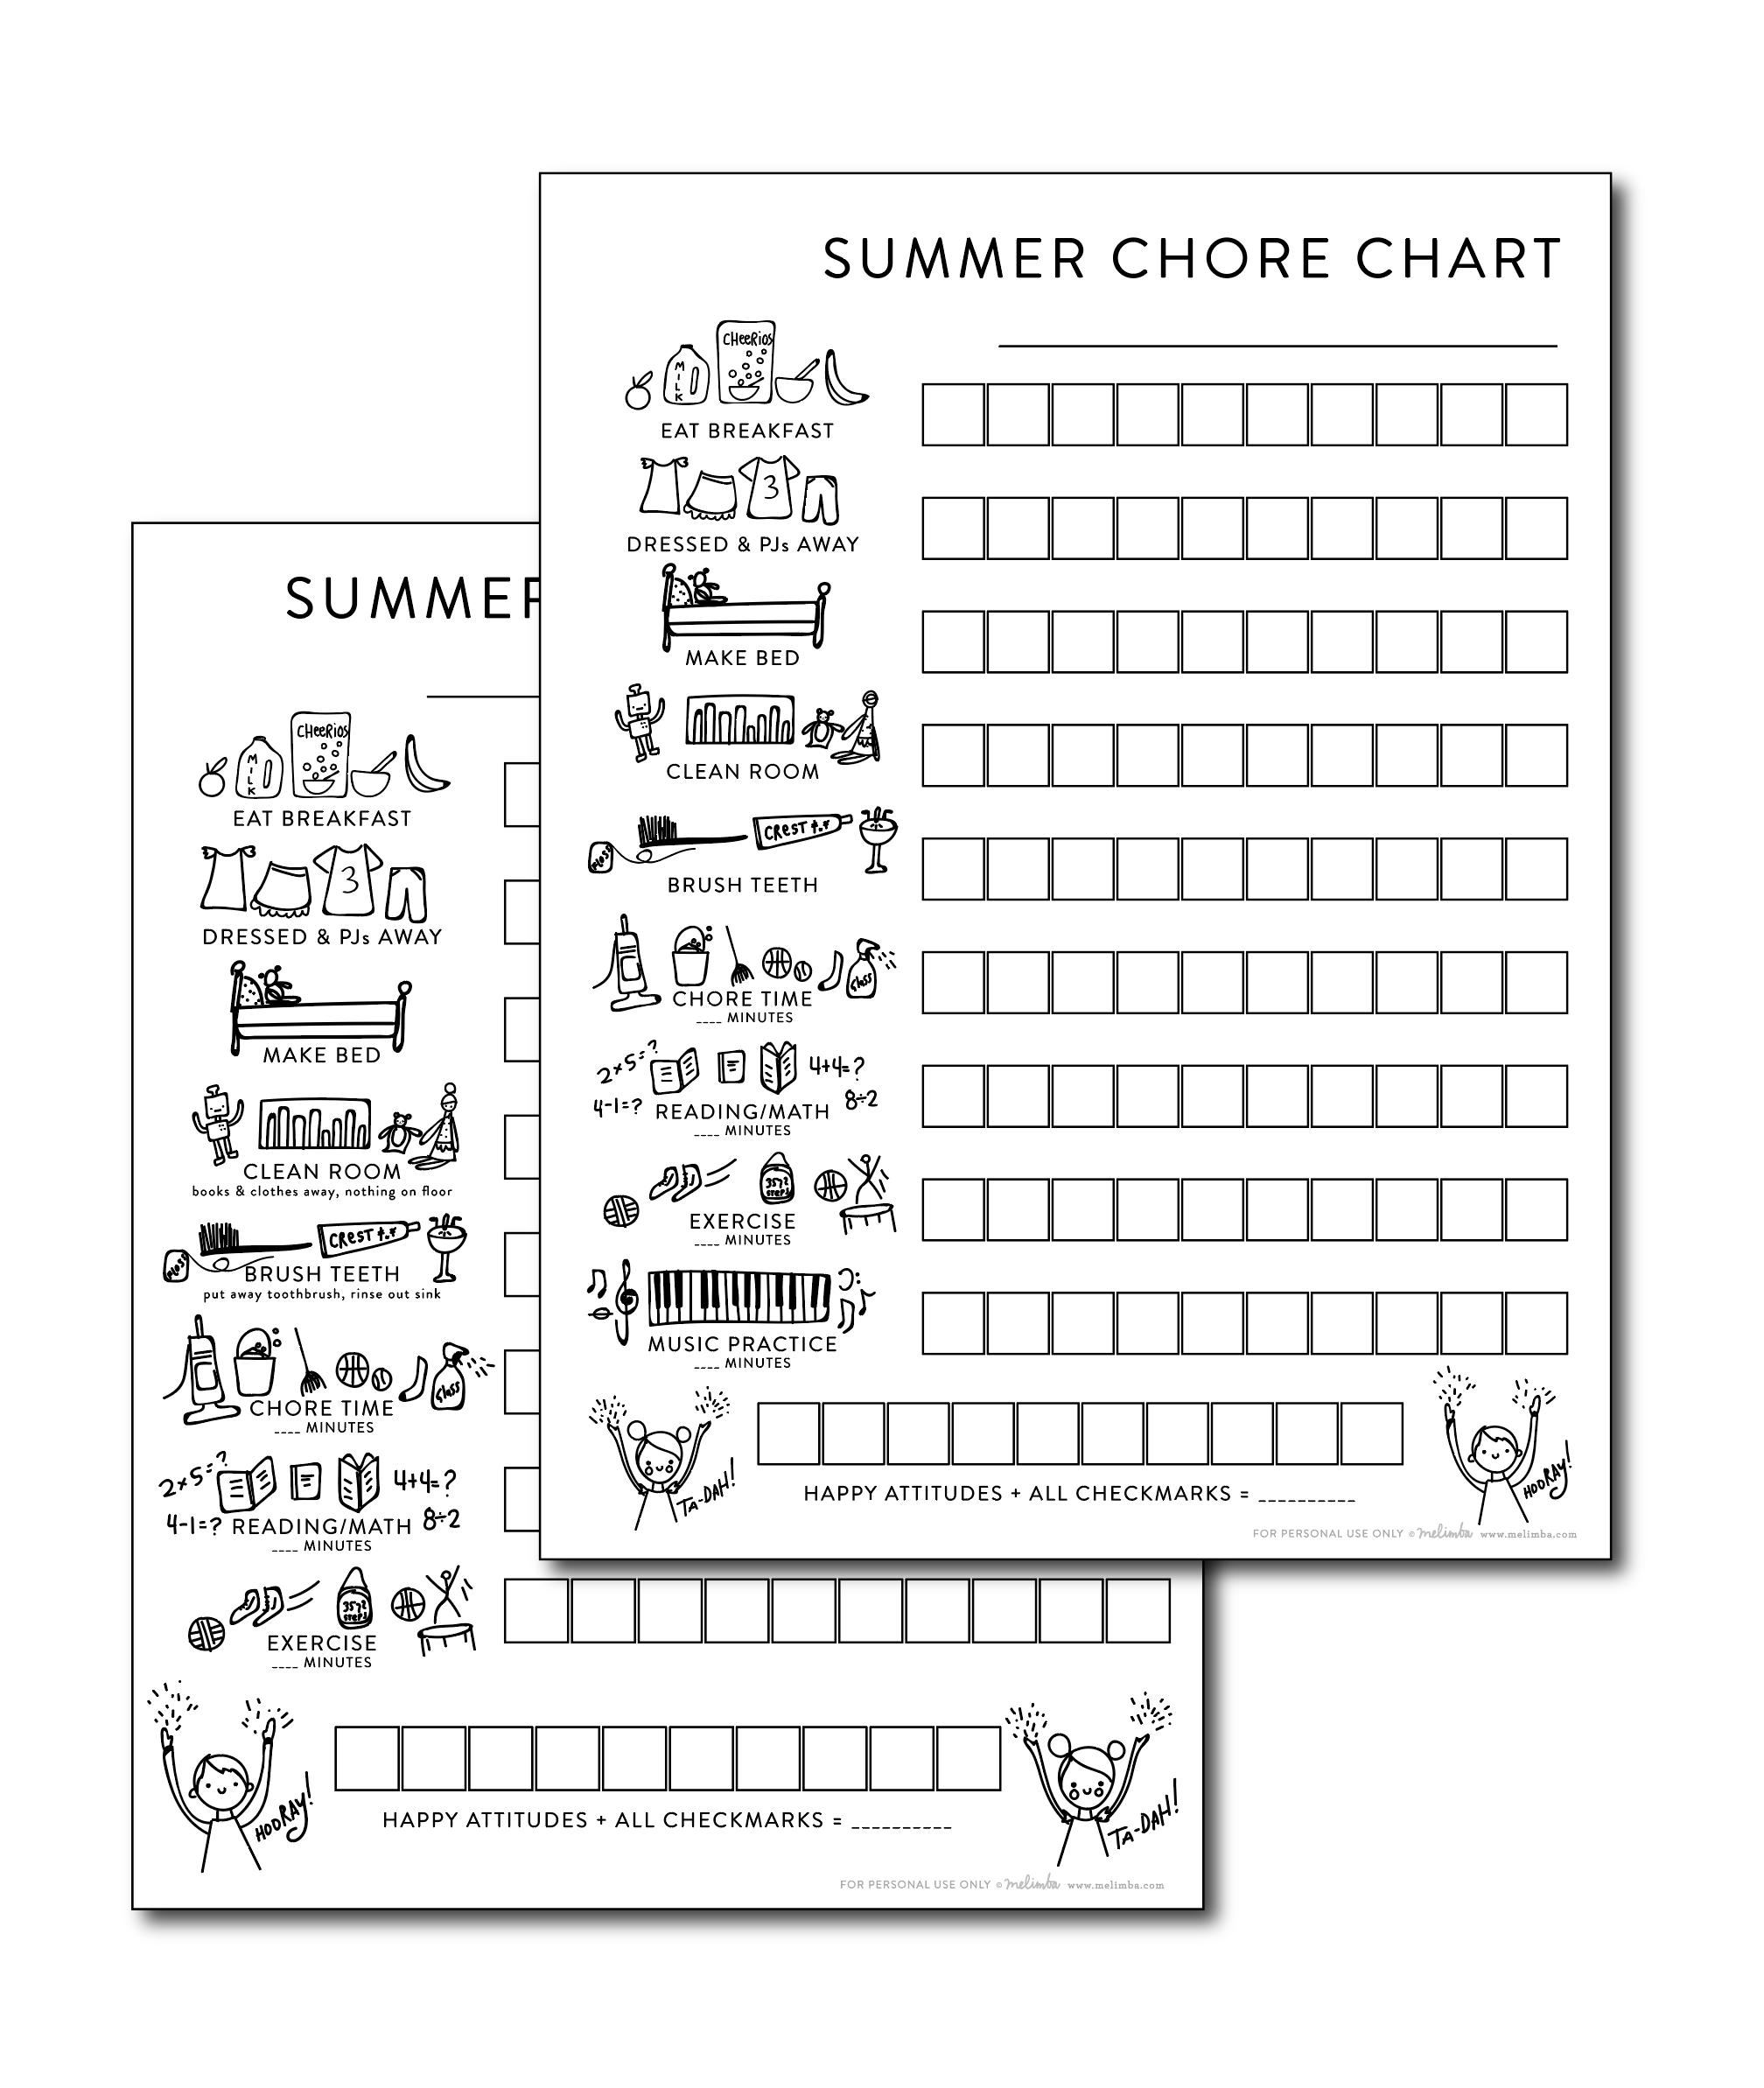 melimba chore chart product shot website